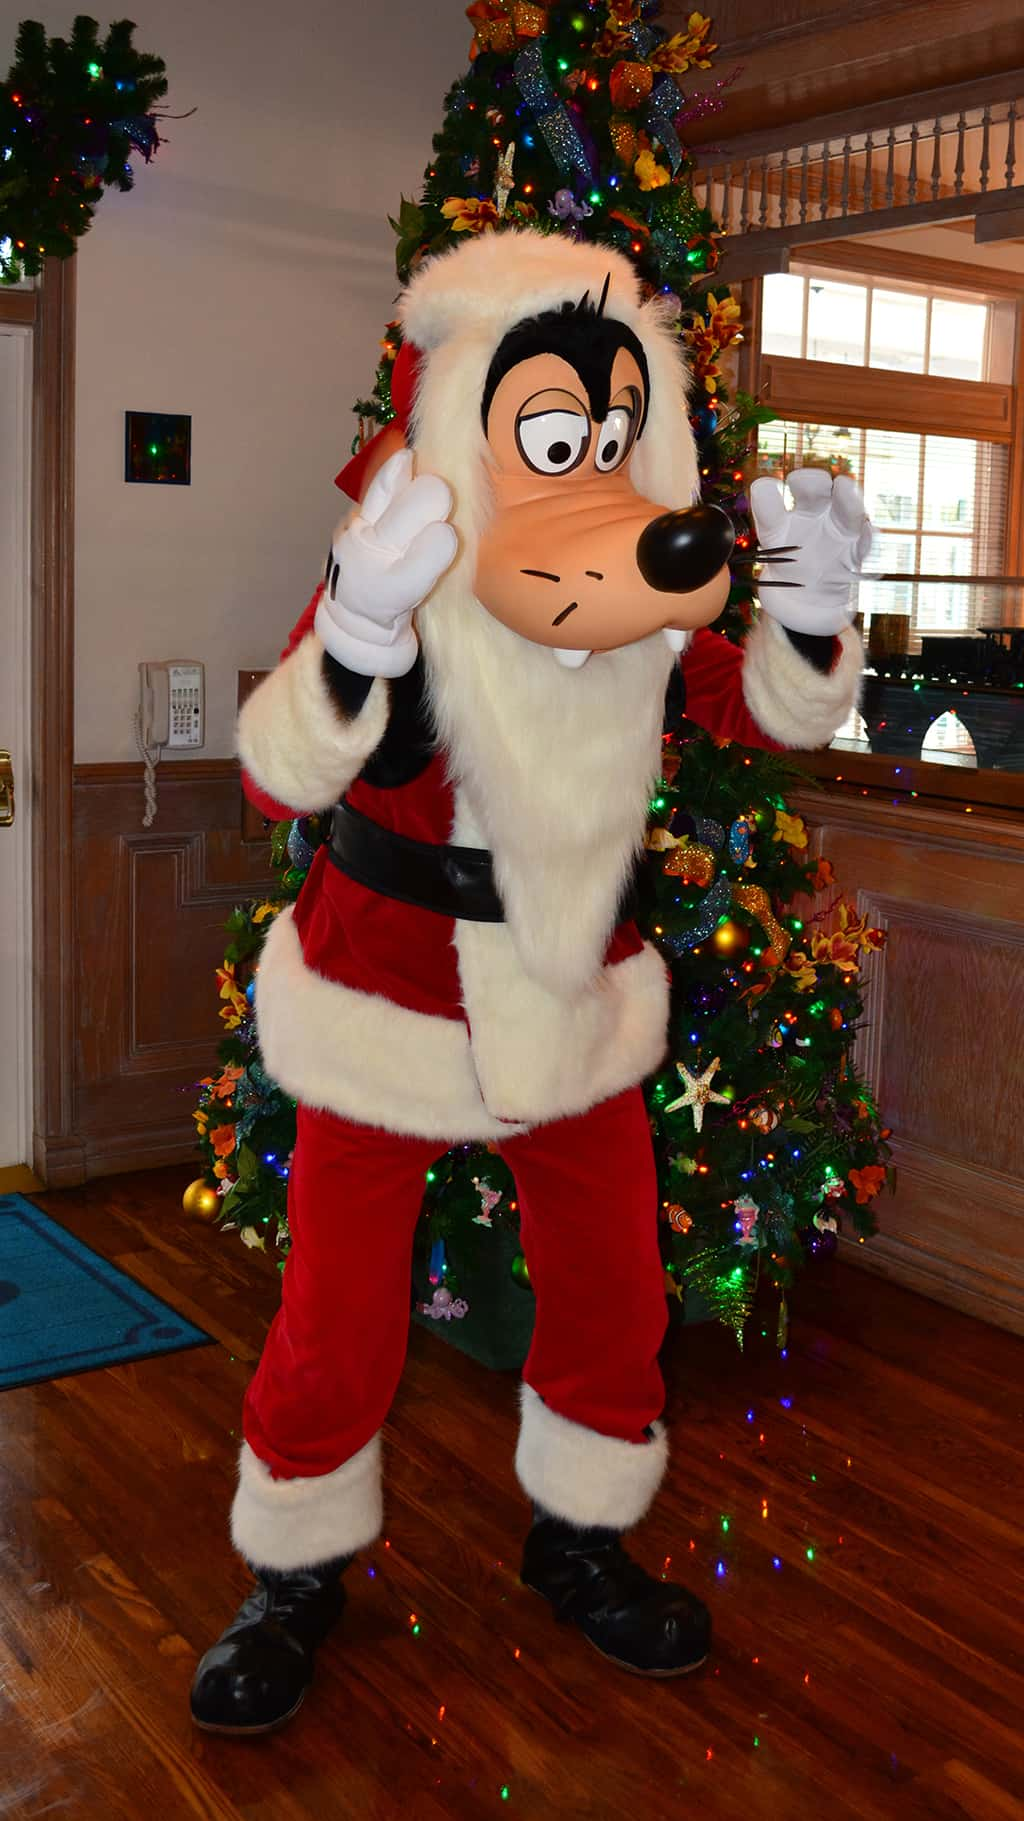 Walt Disney World Old Key West Resort Christmas Characters Santa Goofy Christmas Decor (6)